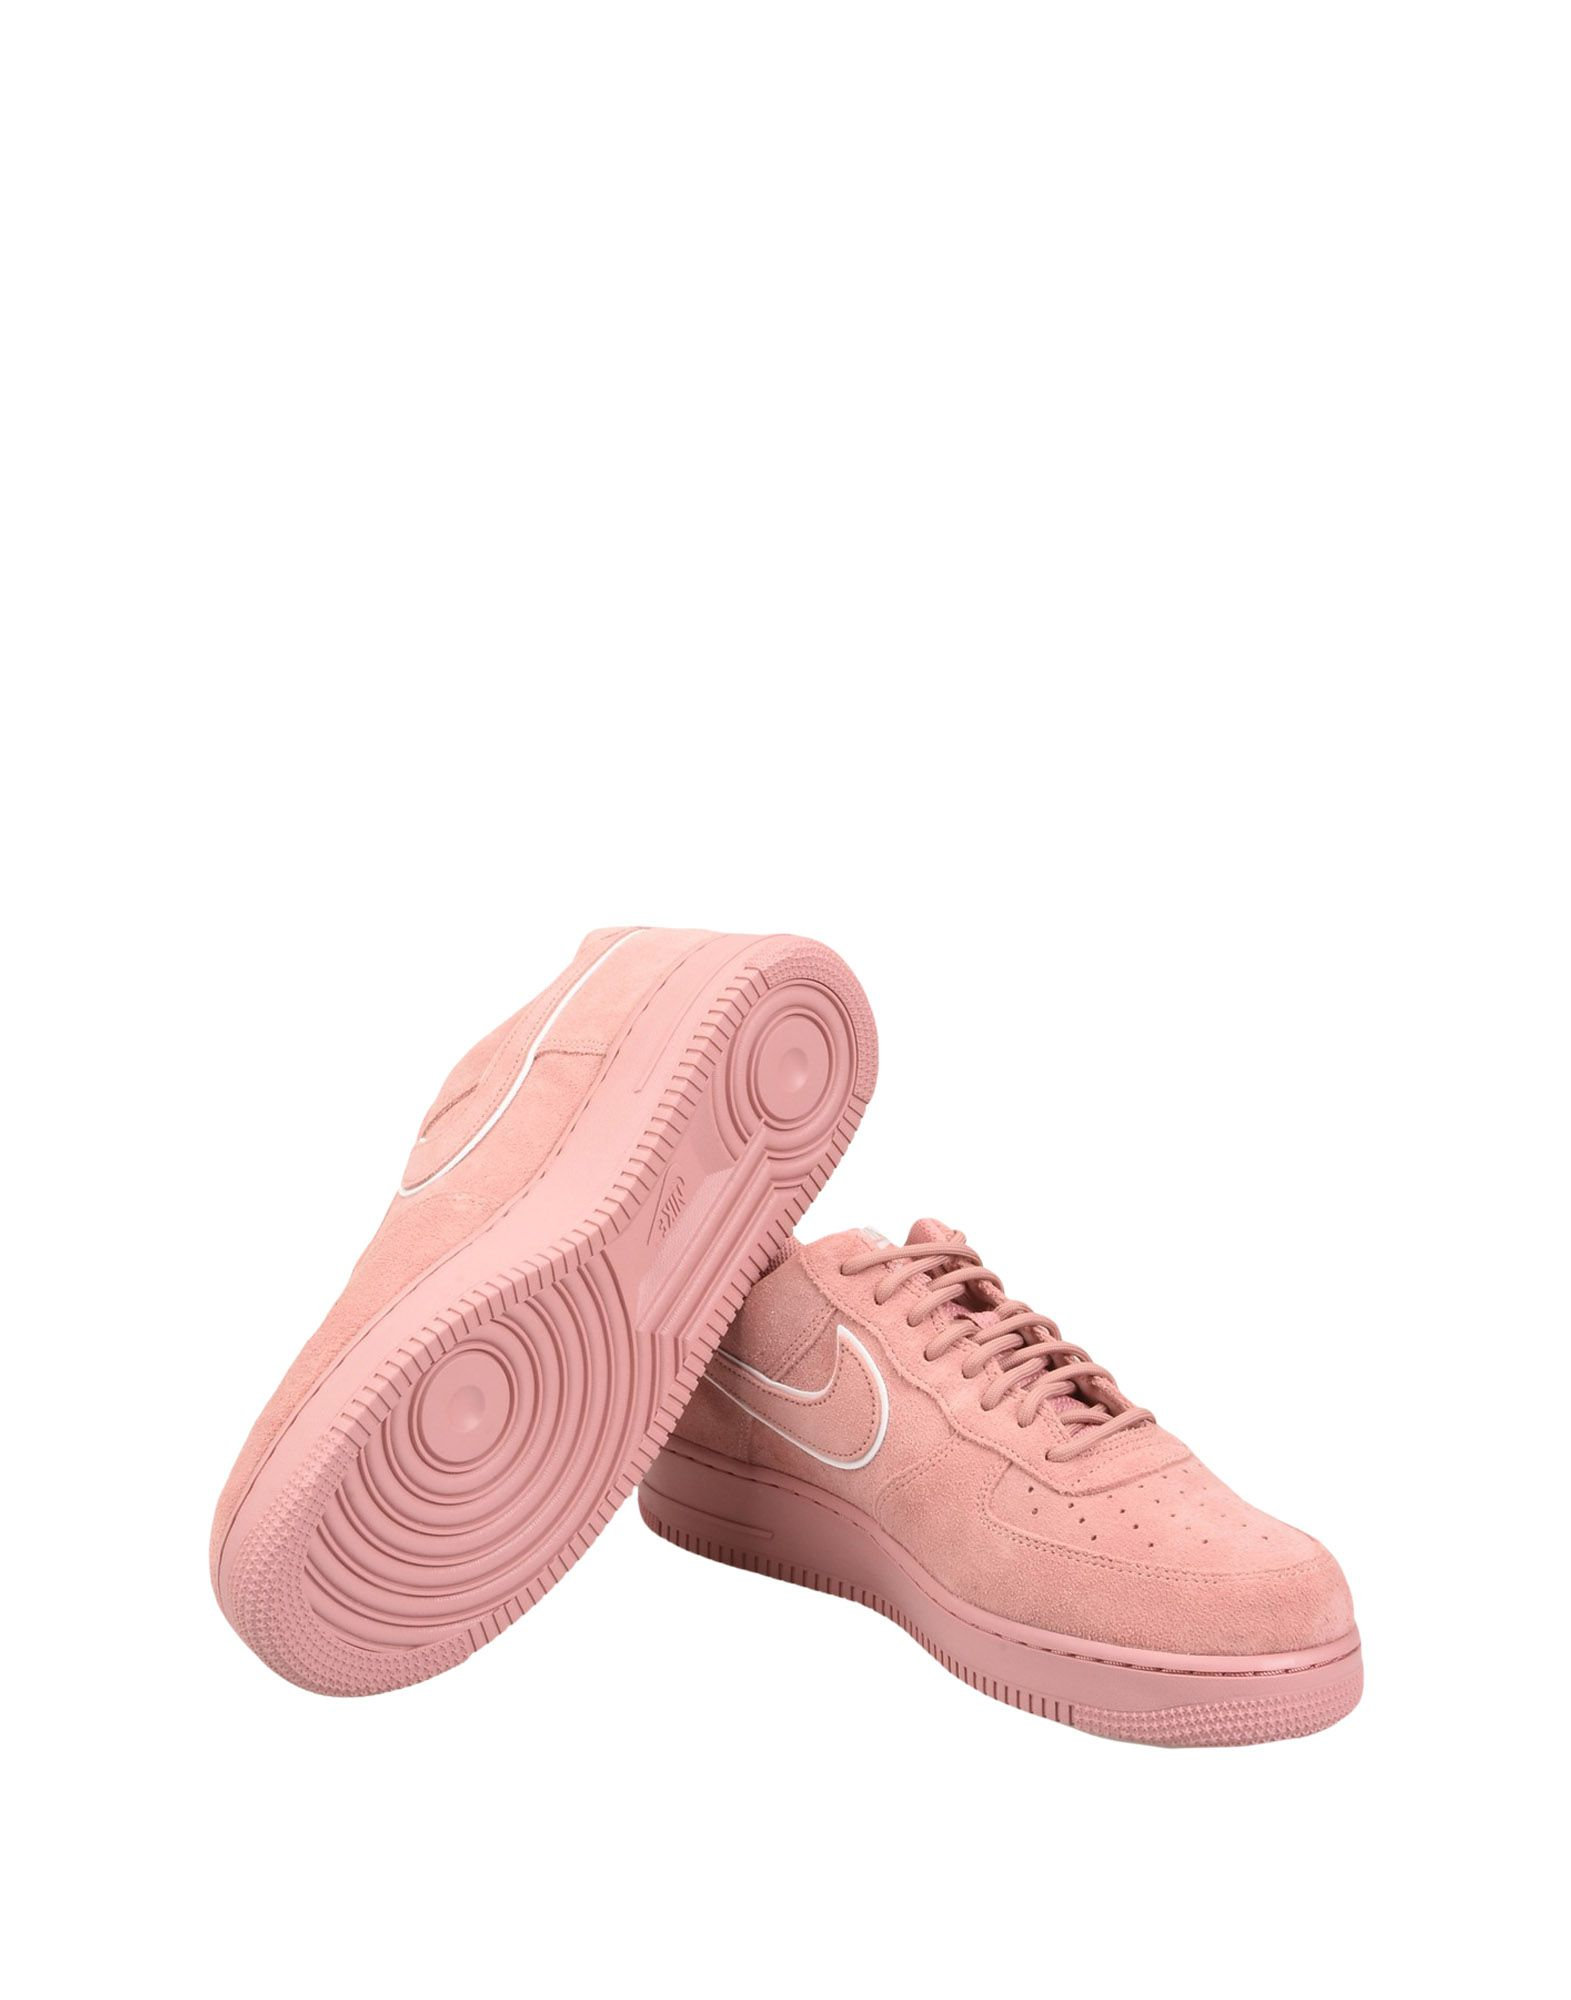 Rabatt echte Schuhe Nike Air Force 1 '07 Lv8 Lv8 Lv8 Suede  11489179JA 6e21cd